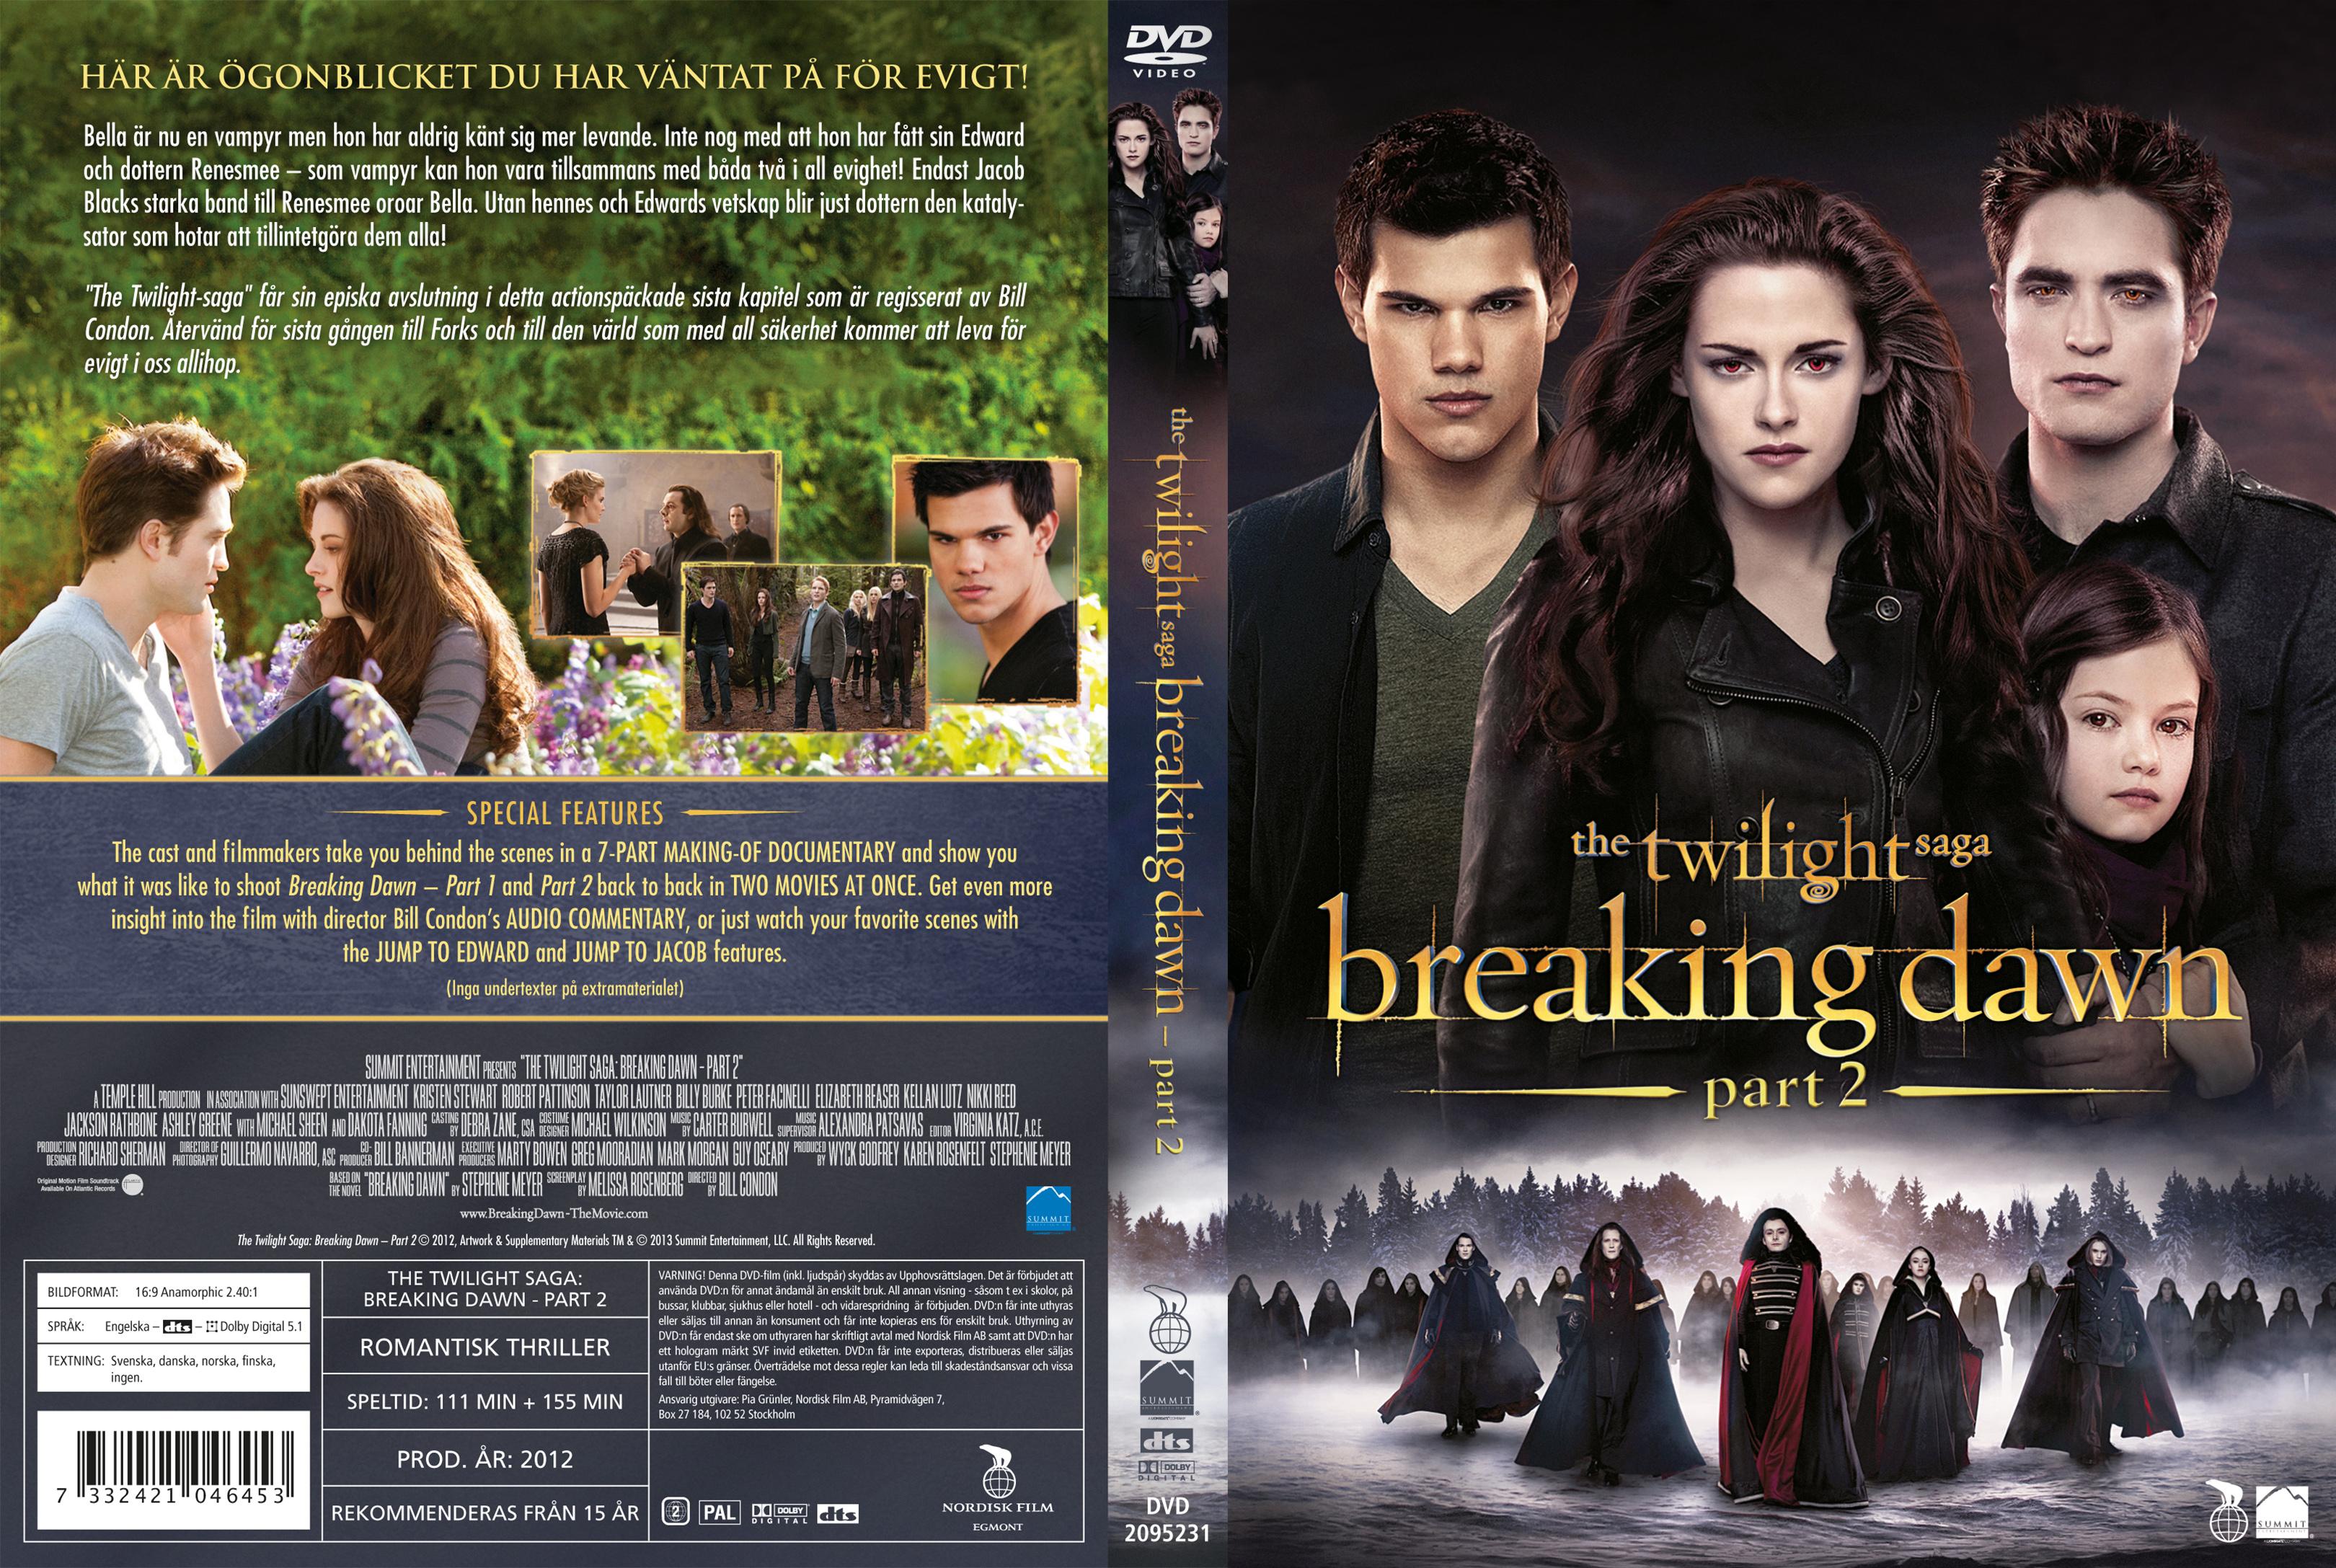 Covers Box Sk The Twilight Saga Breaking Dawn Part 2 2012 High Quality Dvd Blueray Movie